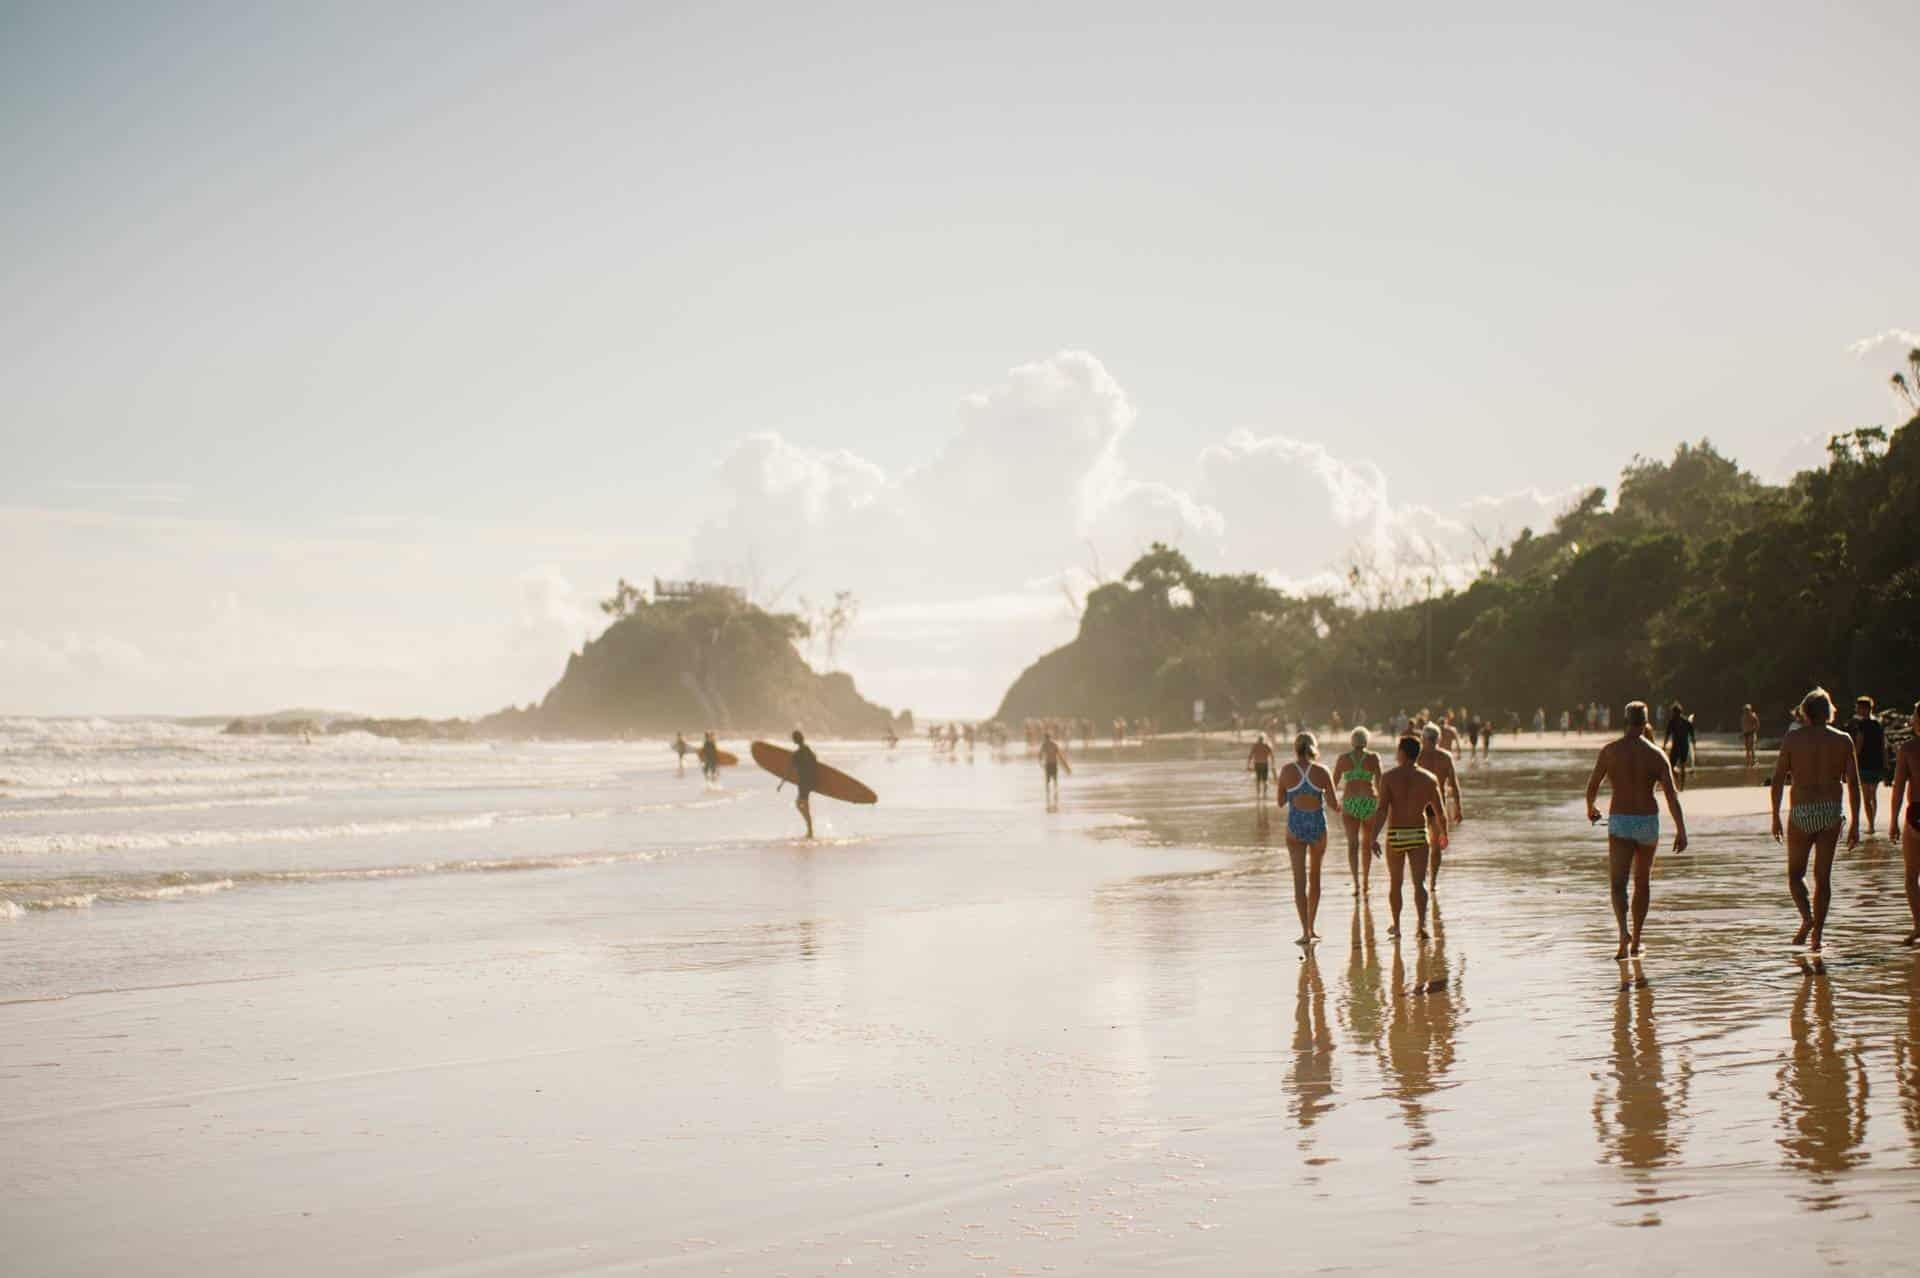 Surfing holidays in Byron Bay, Australia